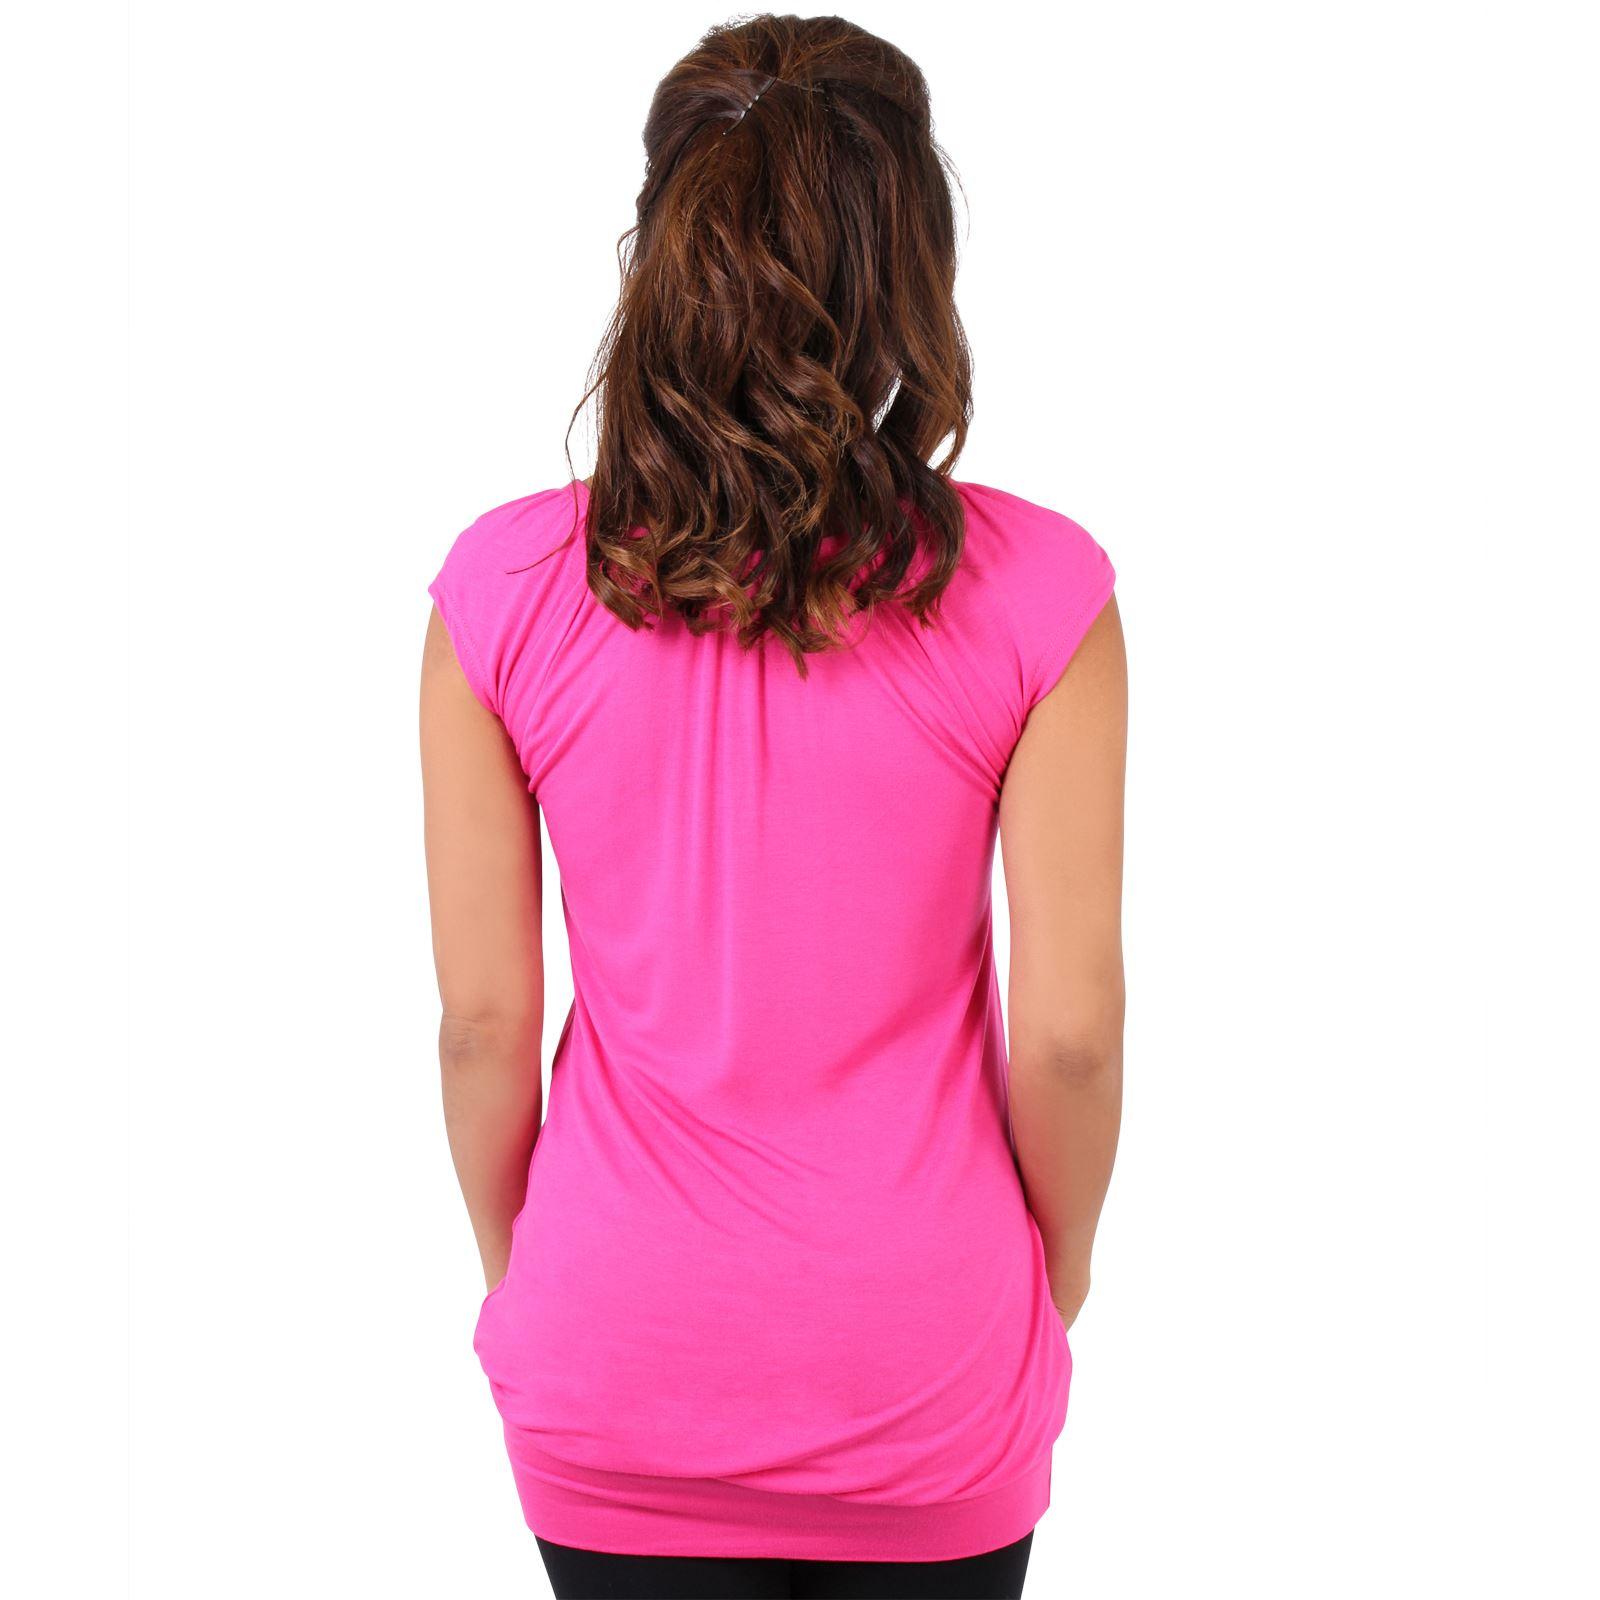 Womens-Ladies-Plain-T-Shirt-Short-Sleeve-Long-Loose-V-Neck-Blouse-Tunic-Top thumbnail 12